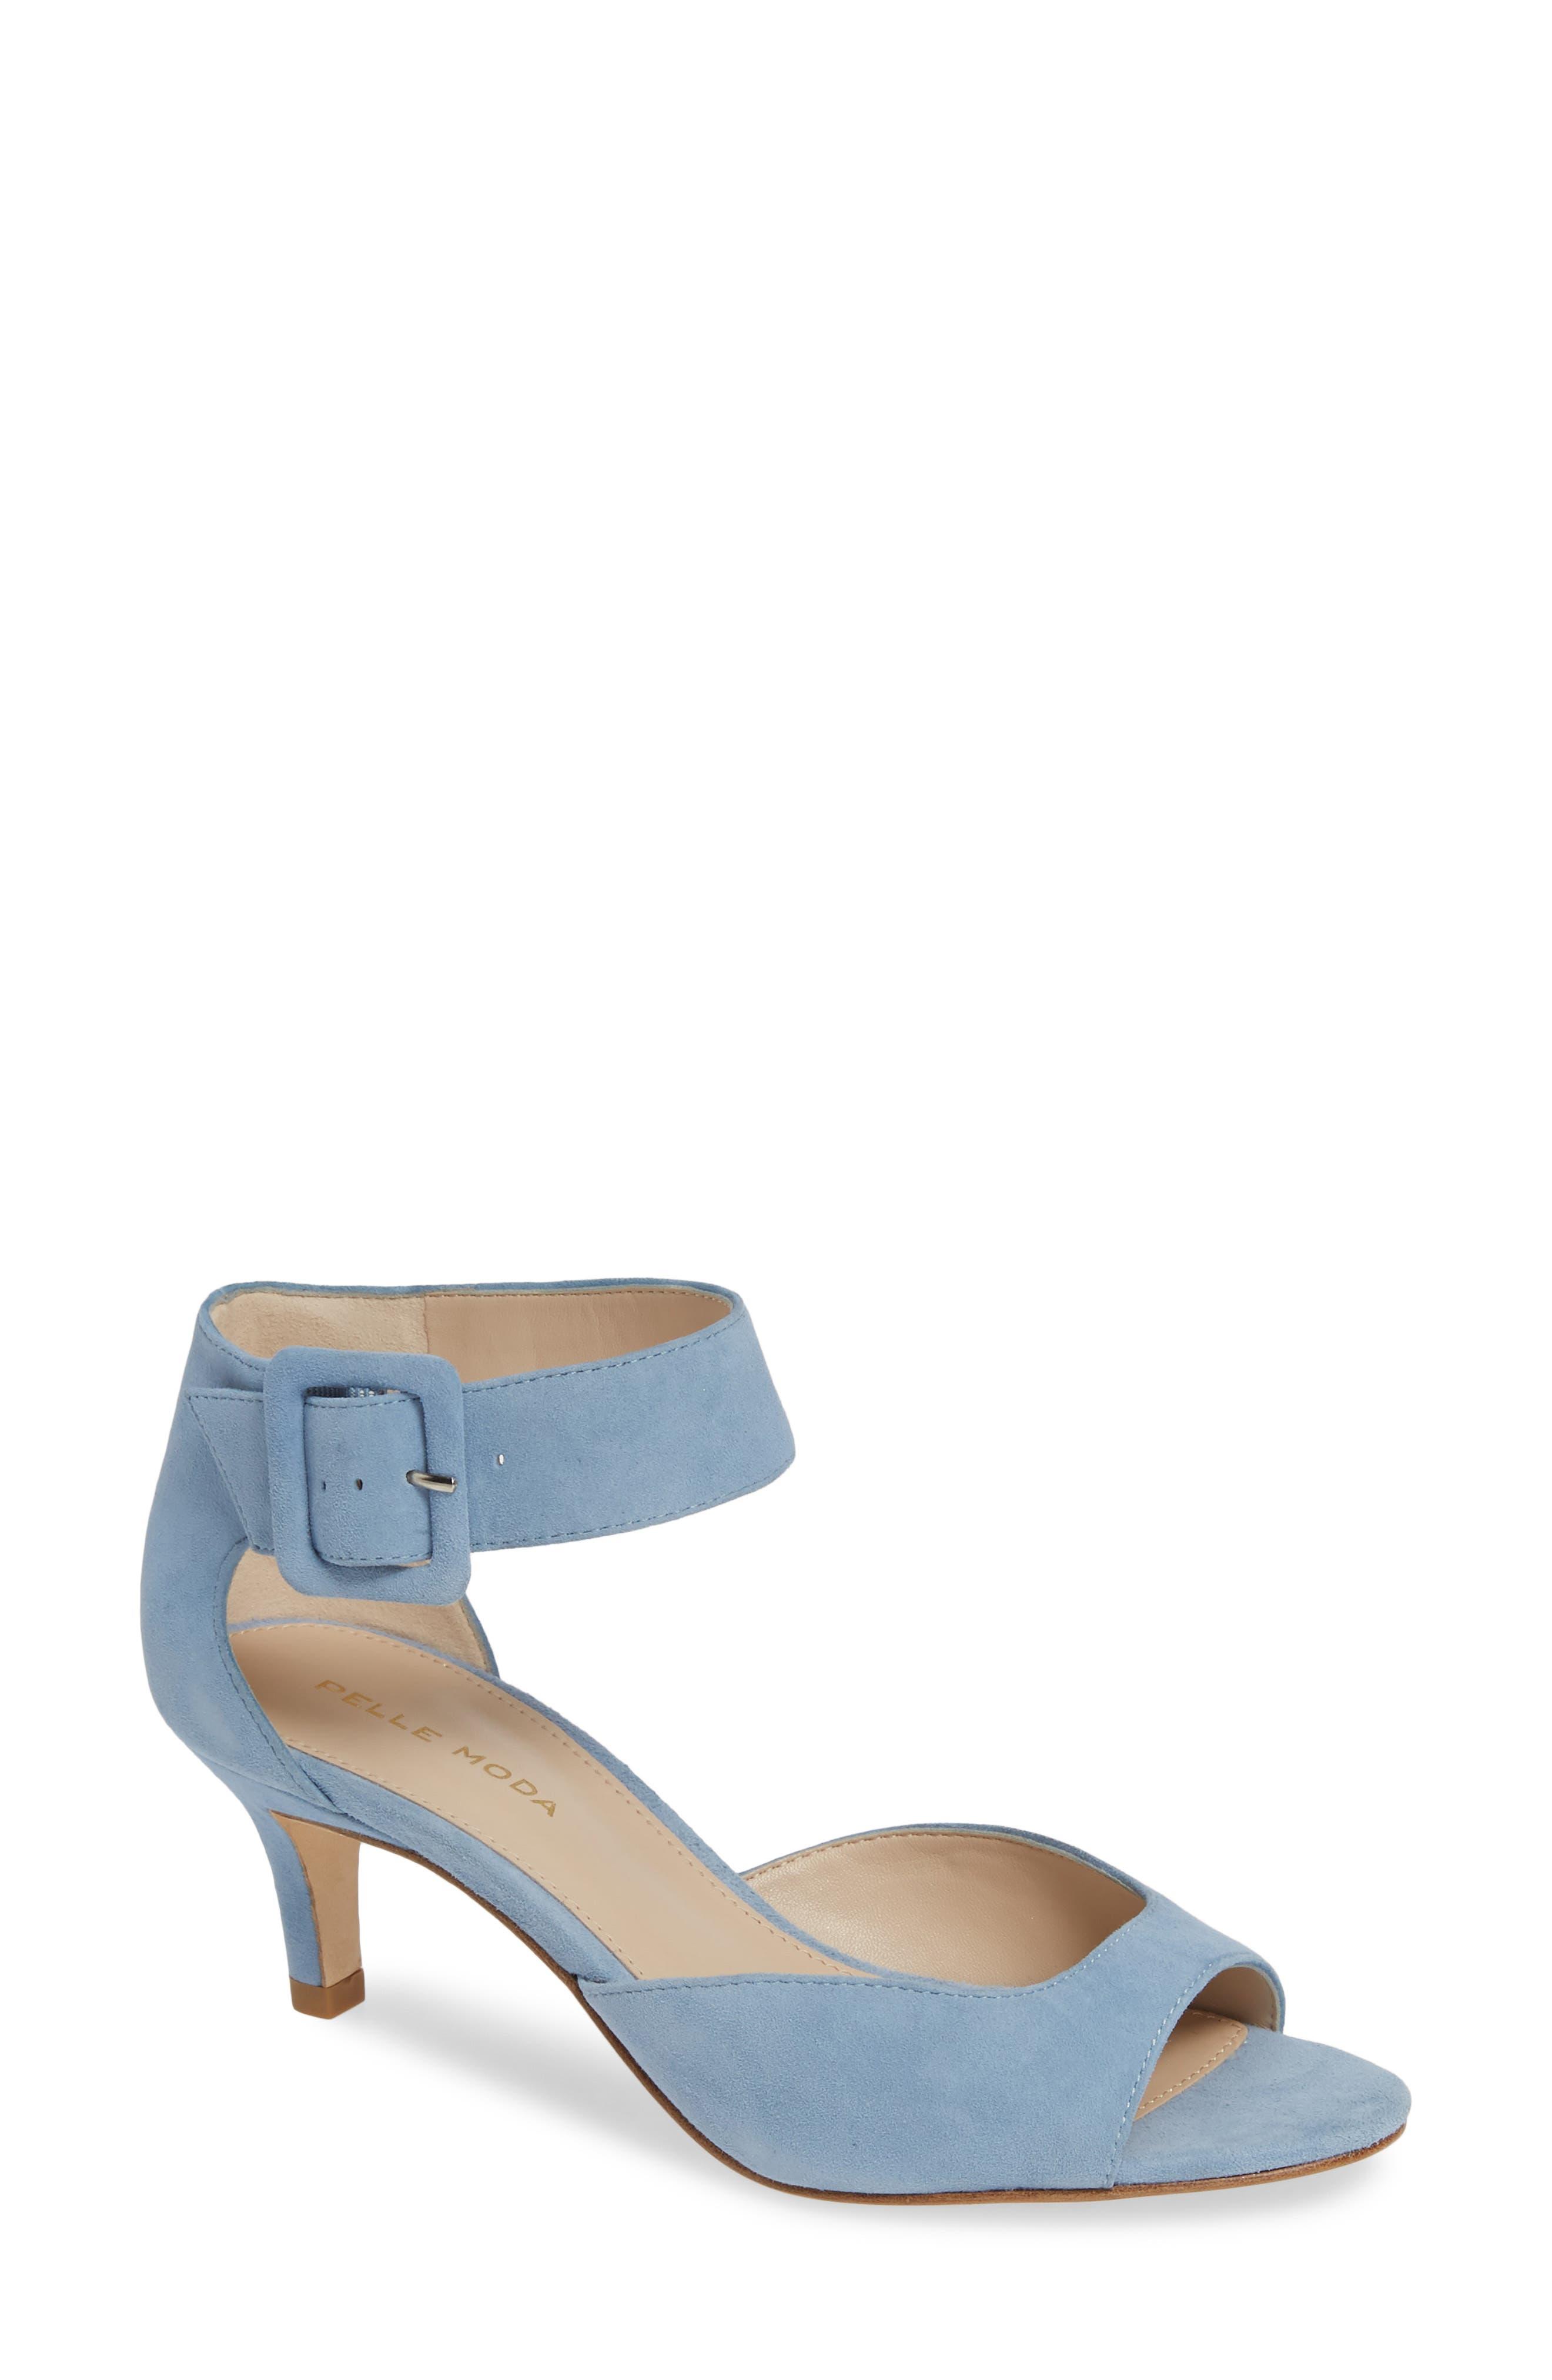 28b613bb3c00 Pelle Moda Sale, Women's Shoes